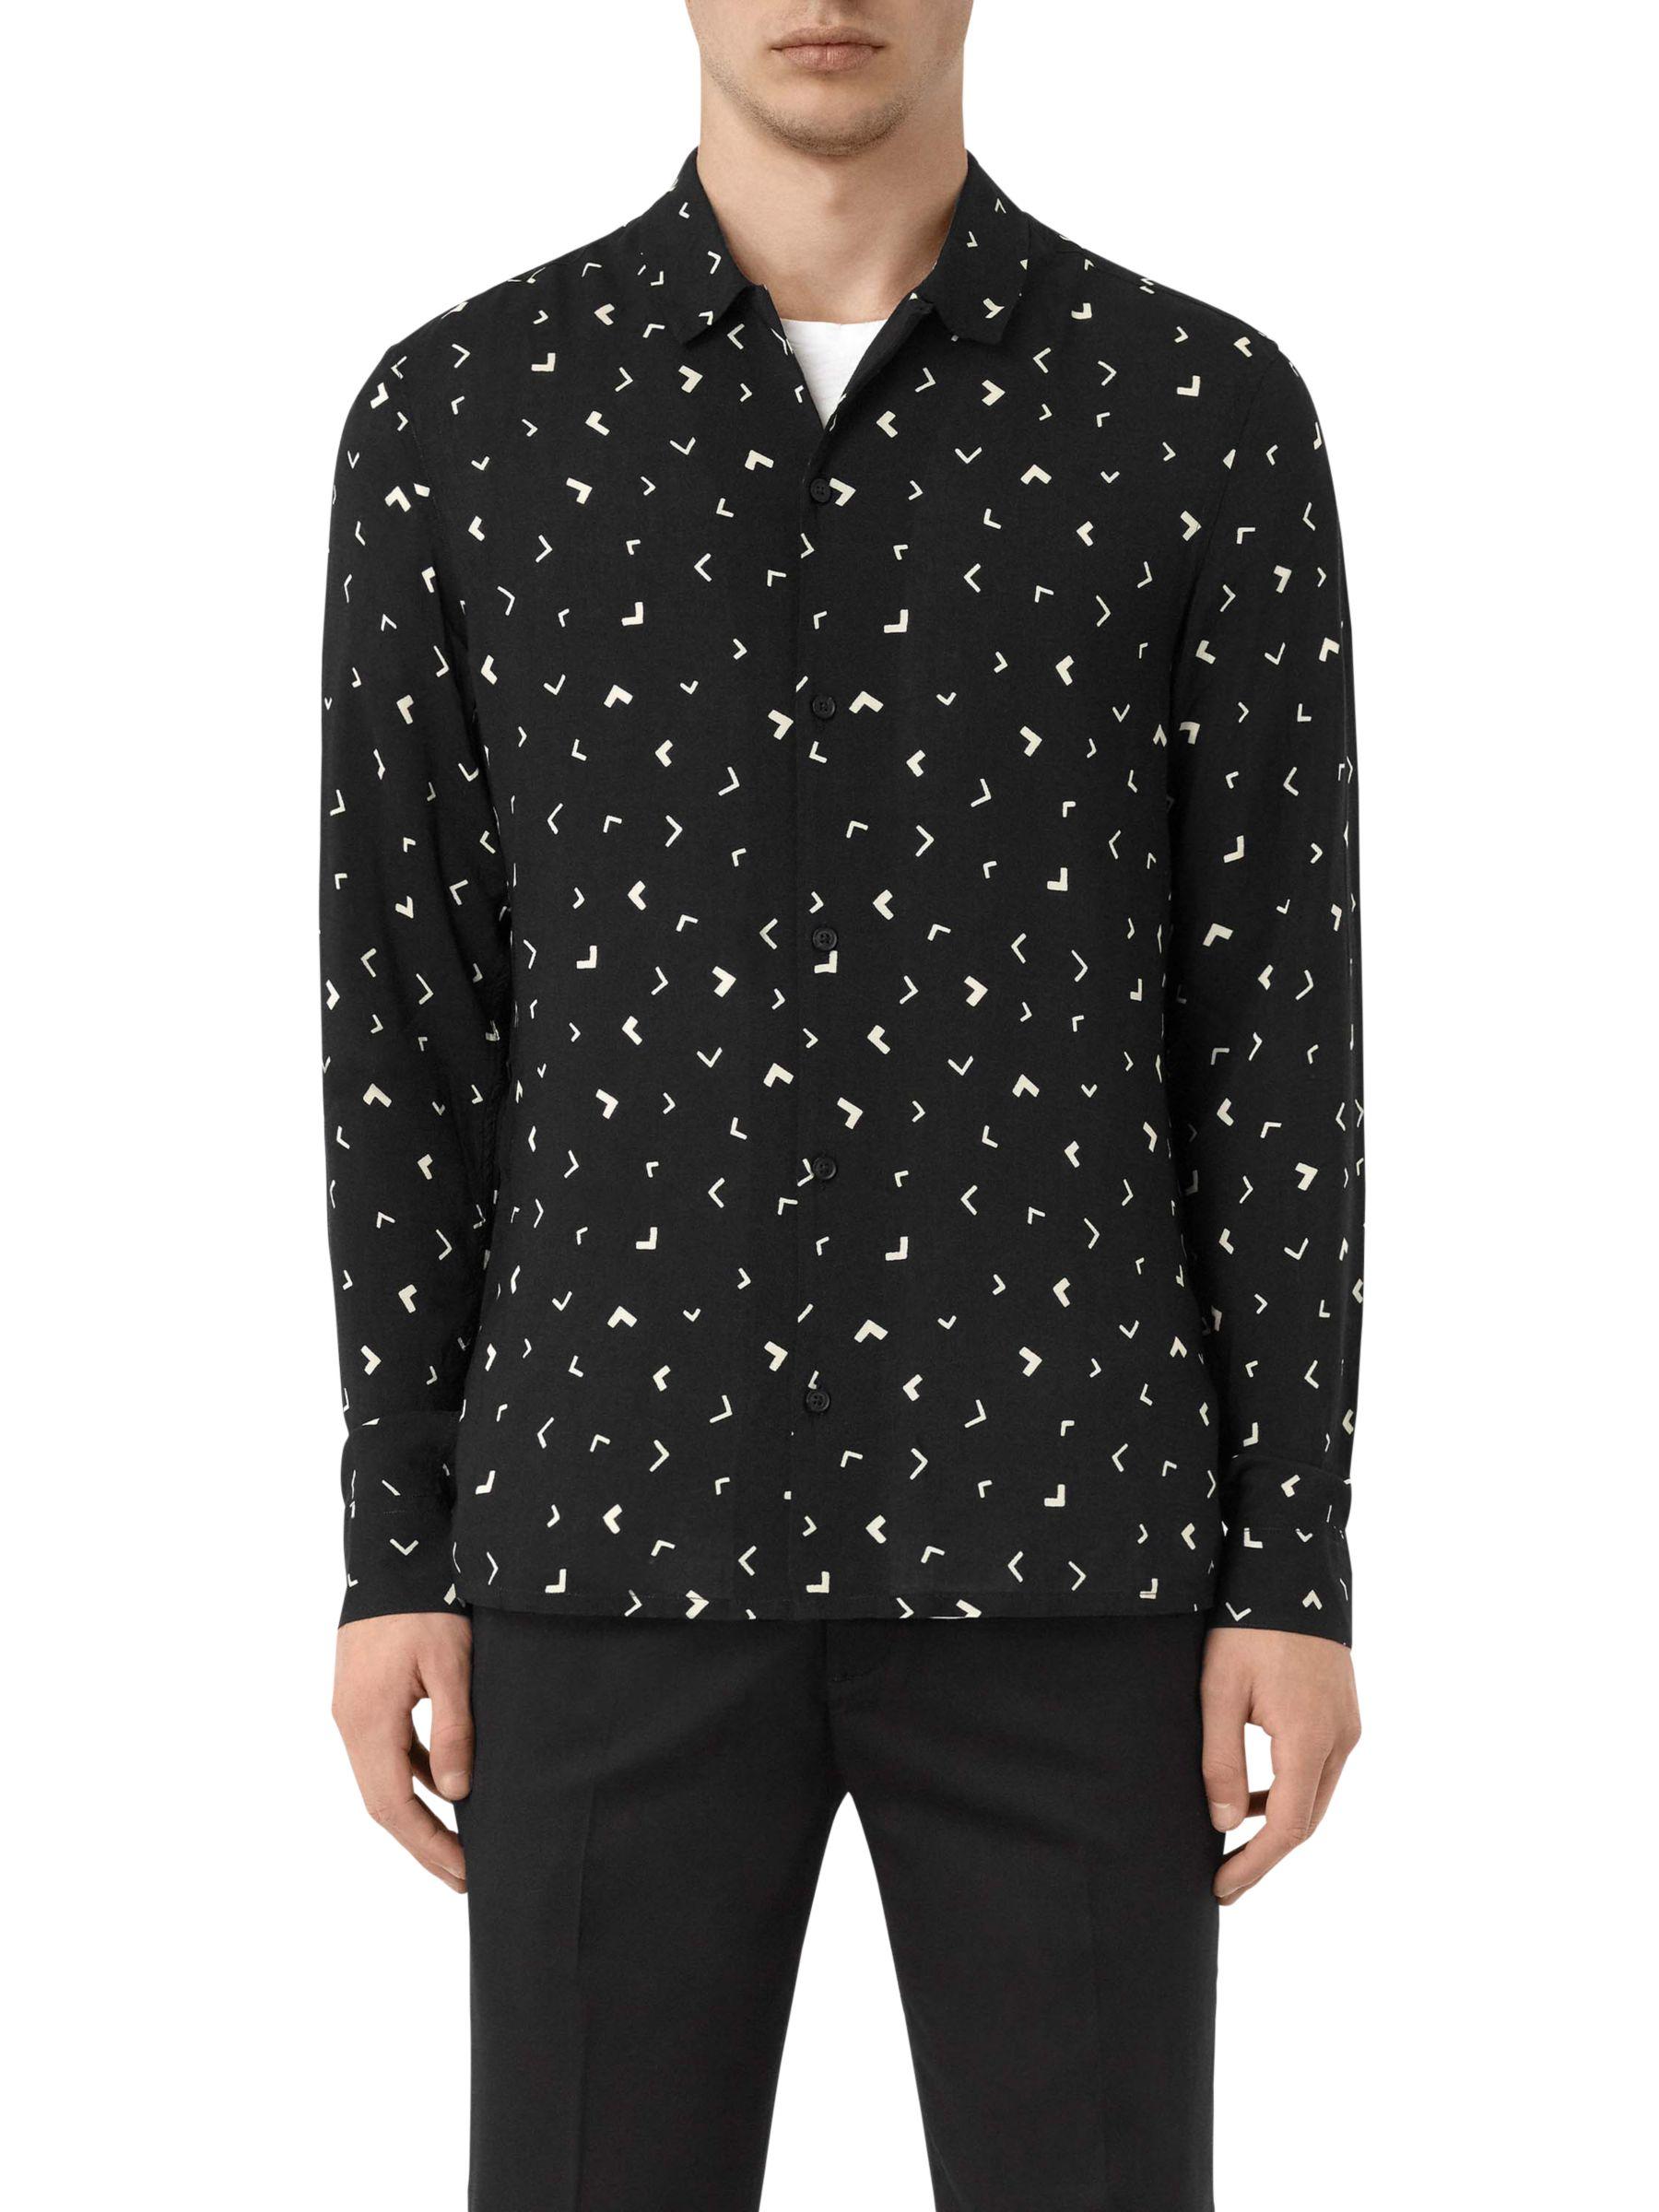 AllSaints AllSaints Vee Abstract Long Sleeve Slim Shirt, Jet Black